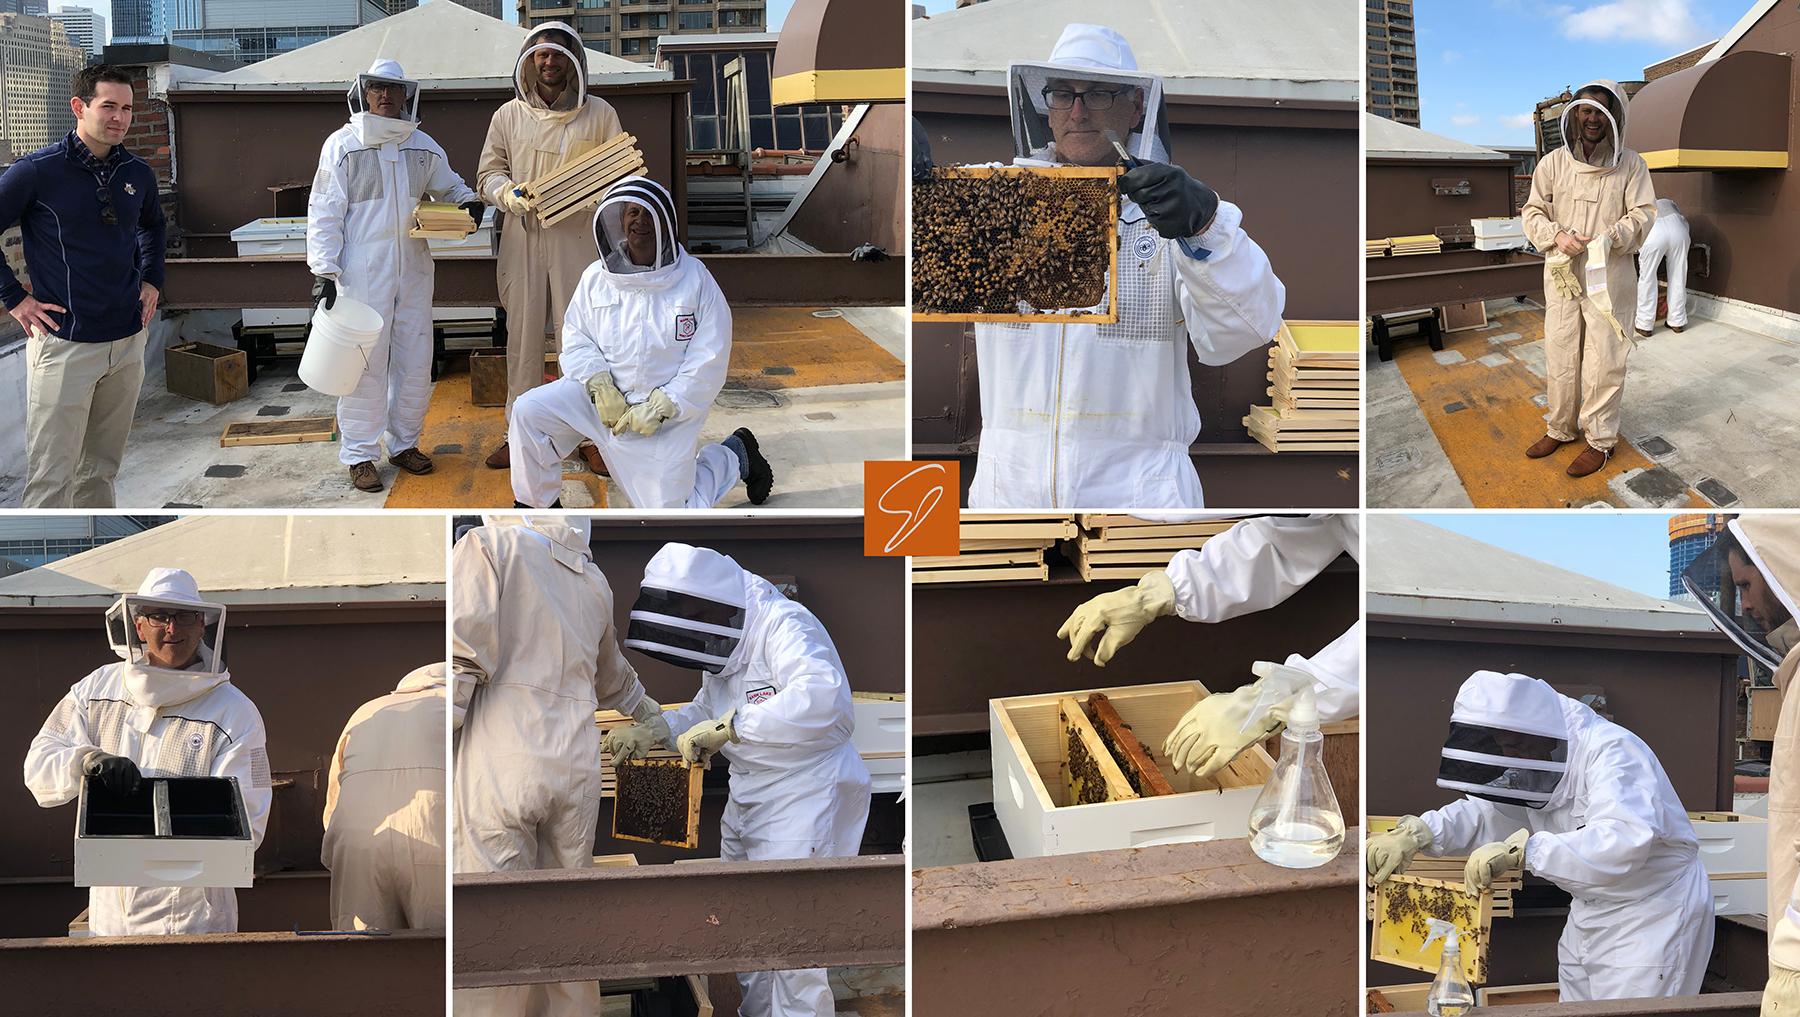 BeekeepingCollage.jpg?mtime=201805141028